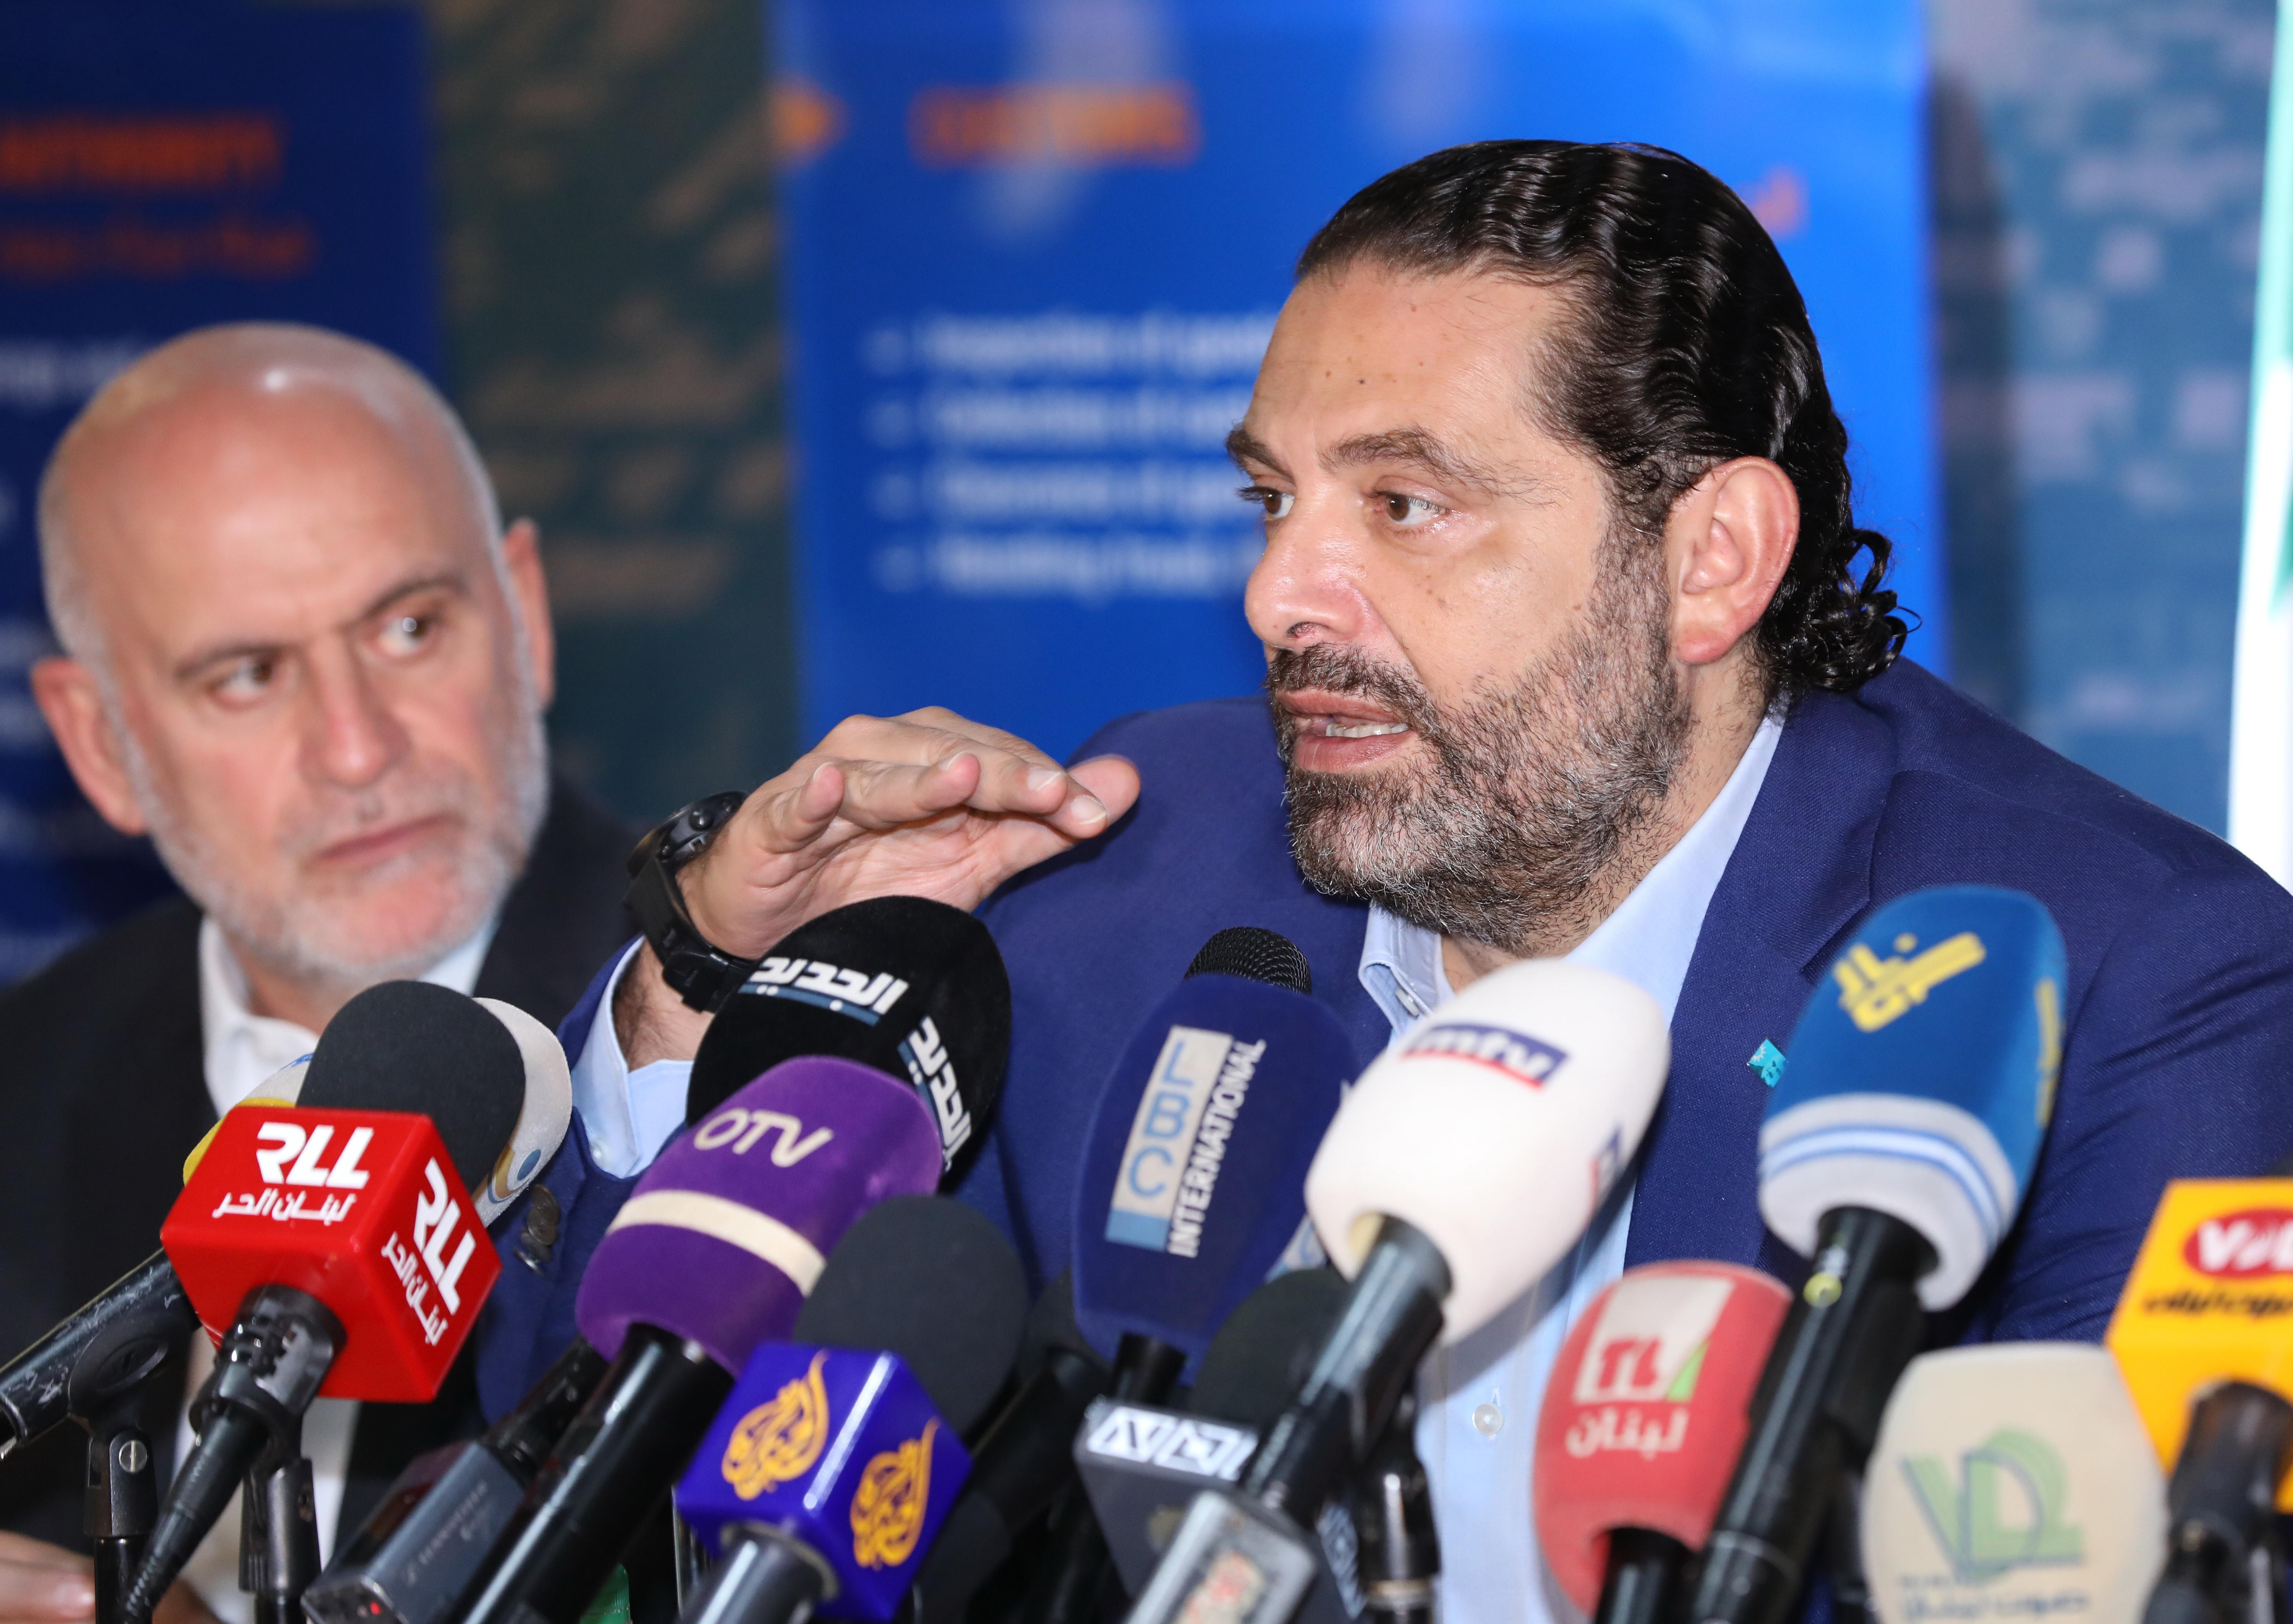 Pr Minister Saad Hariri Visits Beirut Ports 7